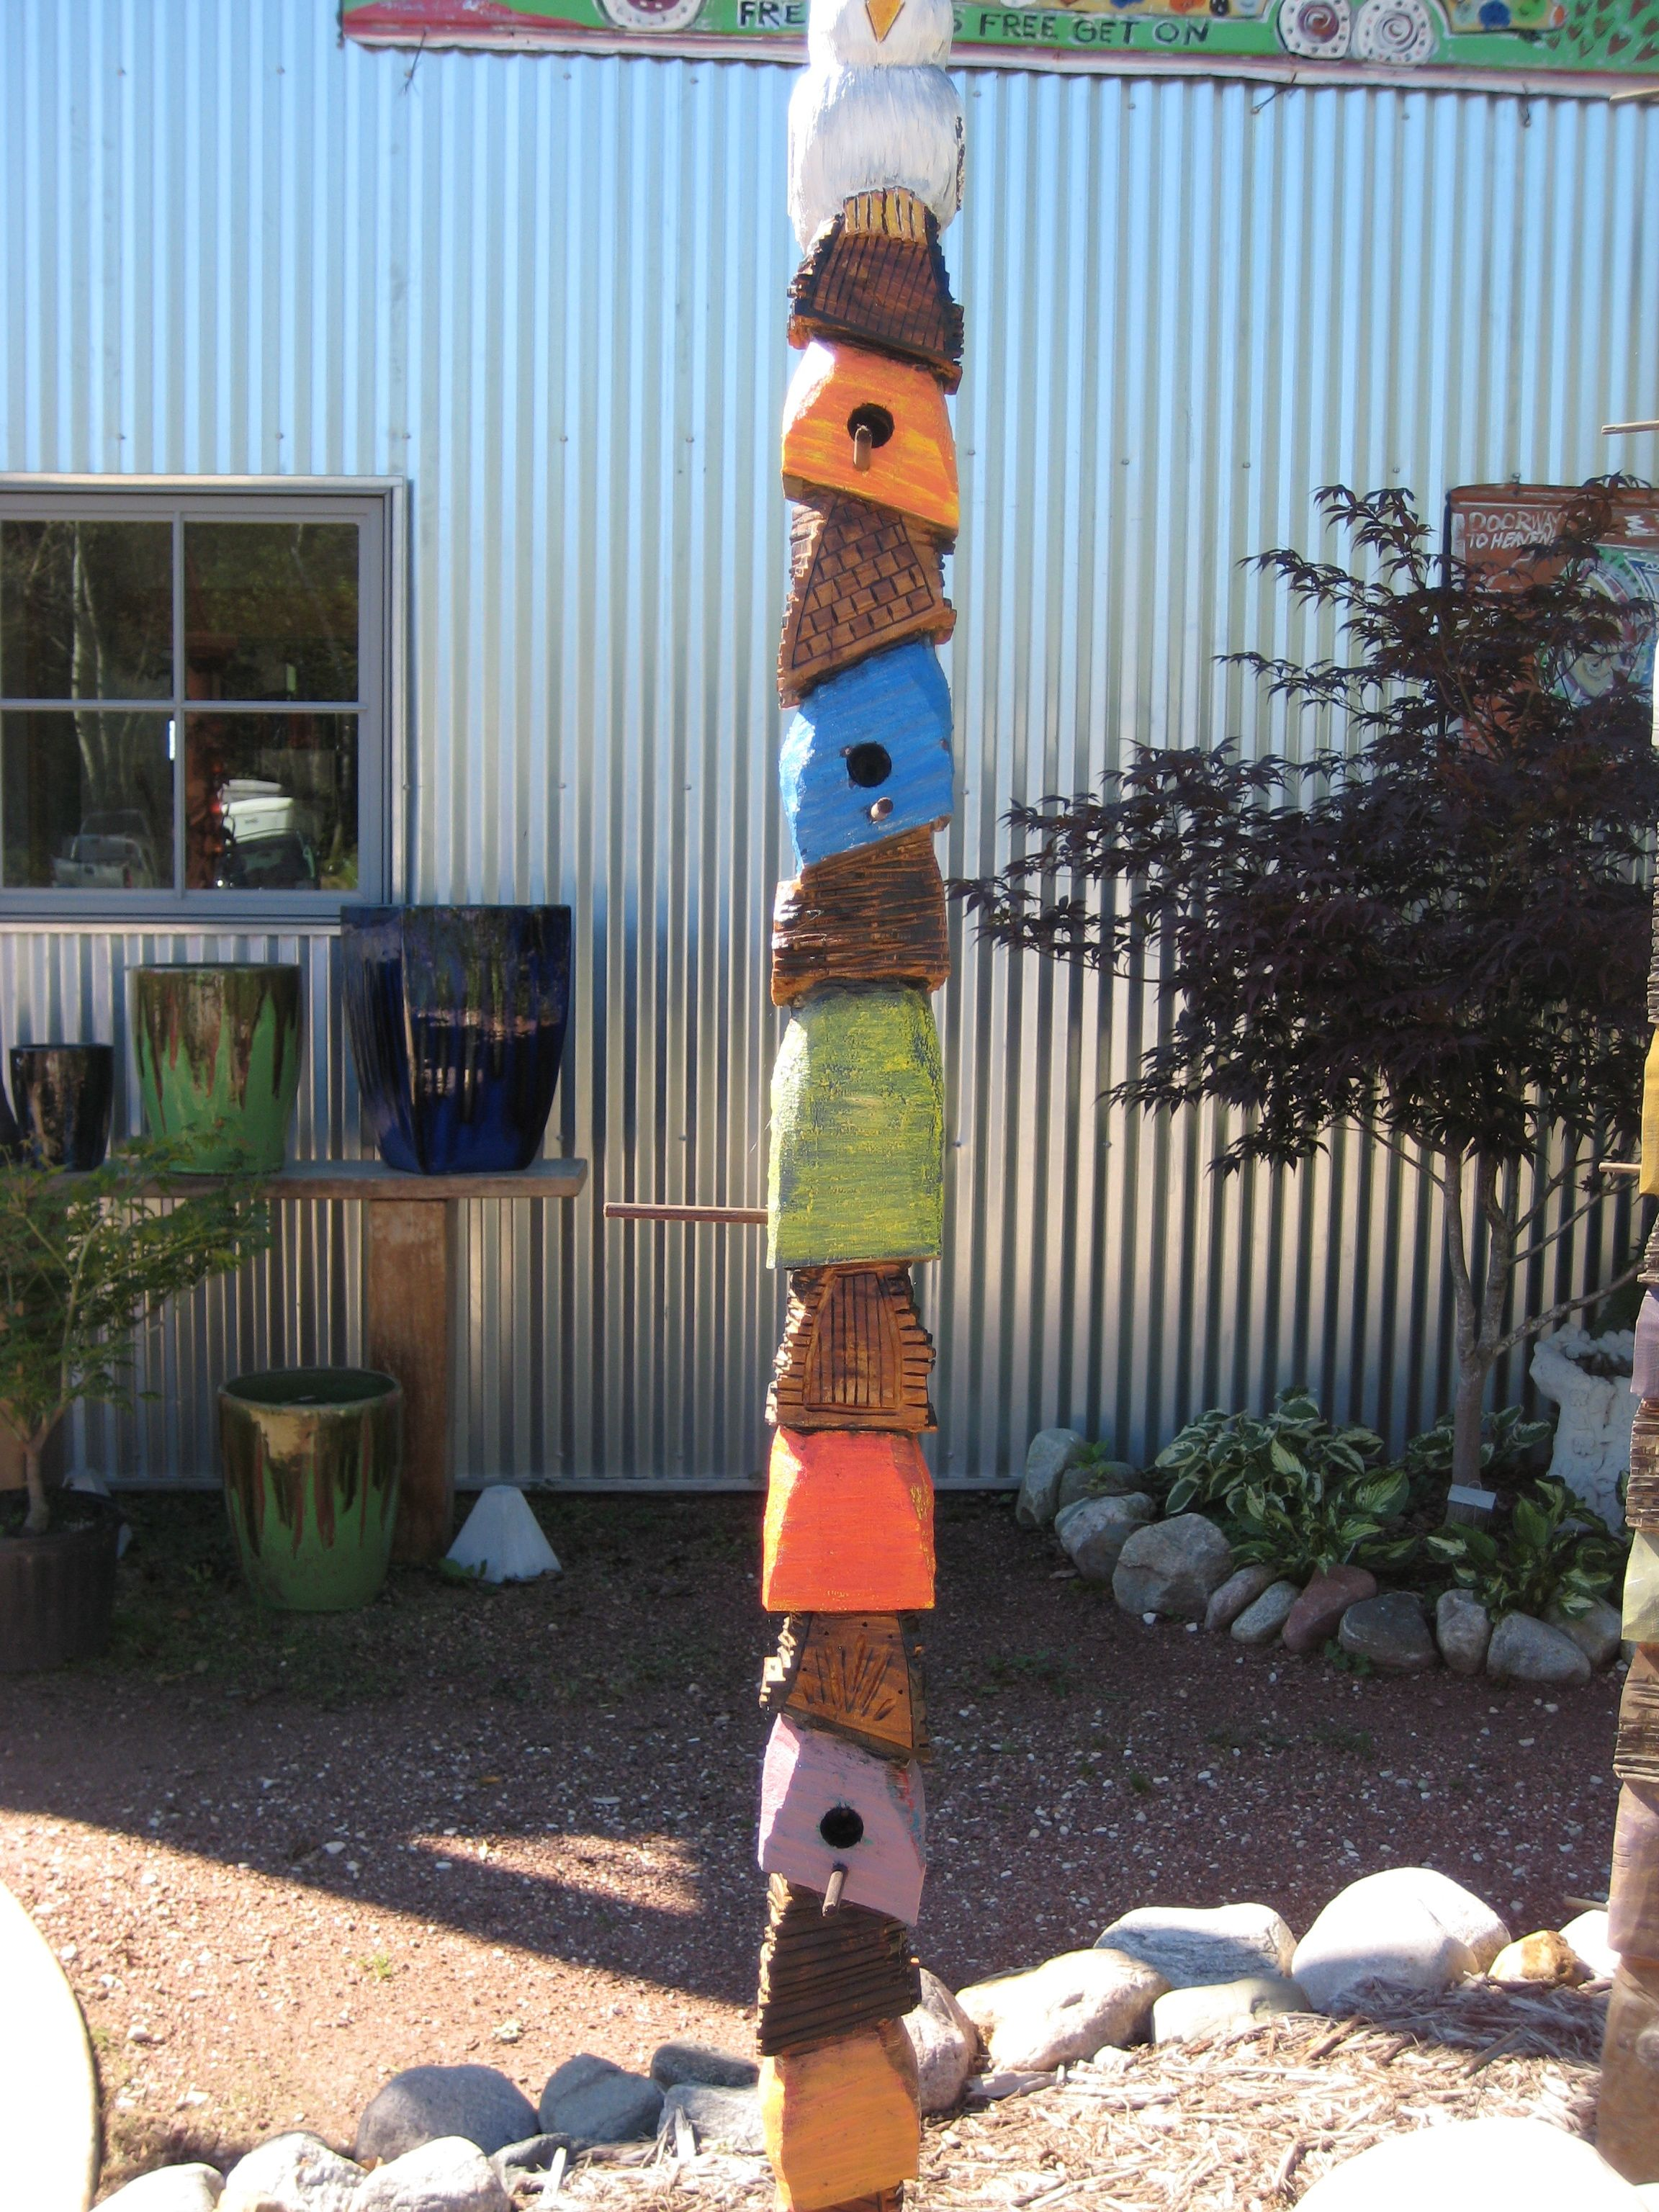 Birdhouse totem for the garden by scott nabblefeldt found